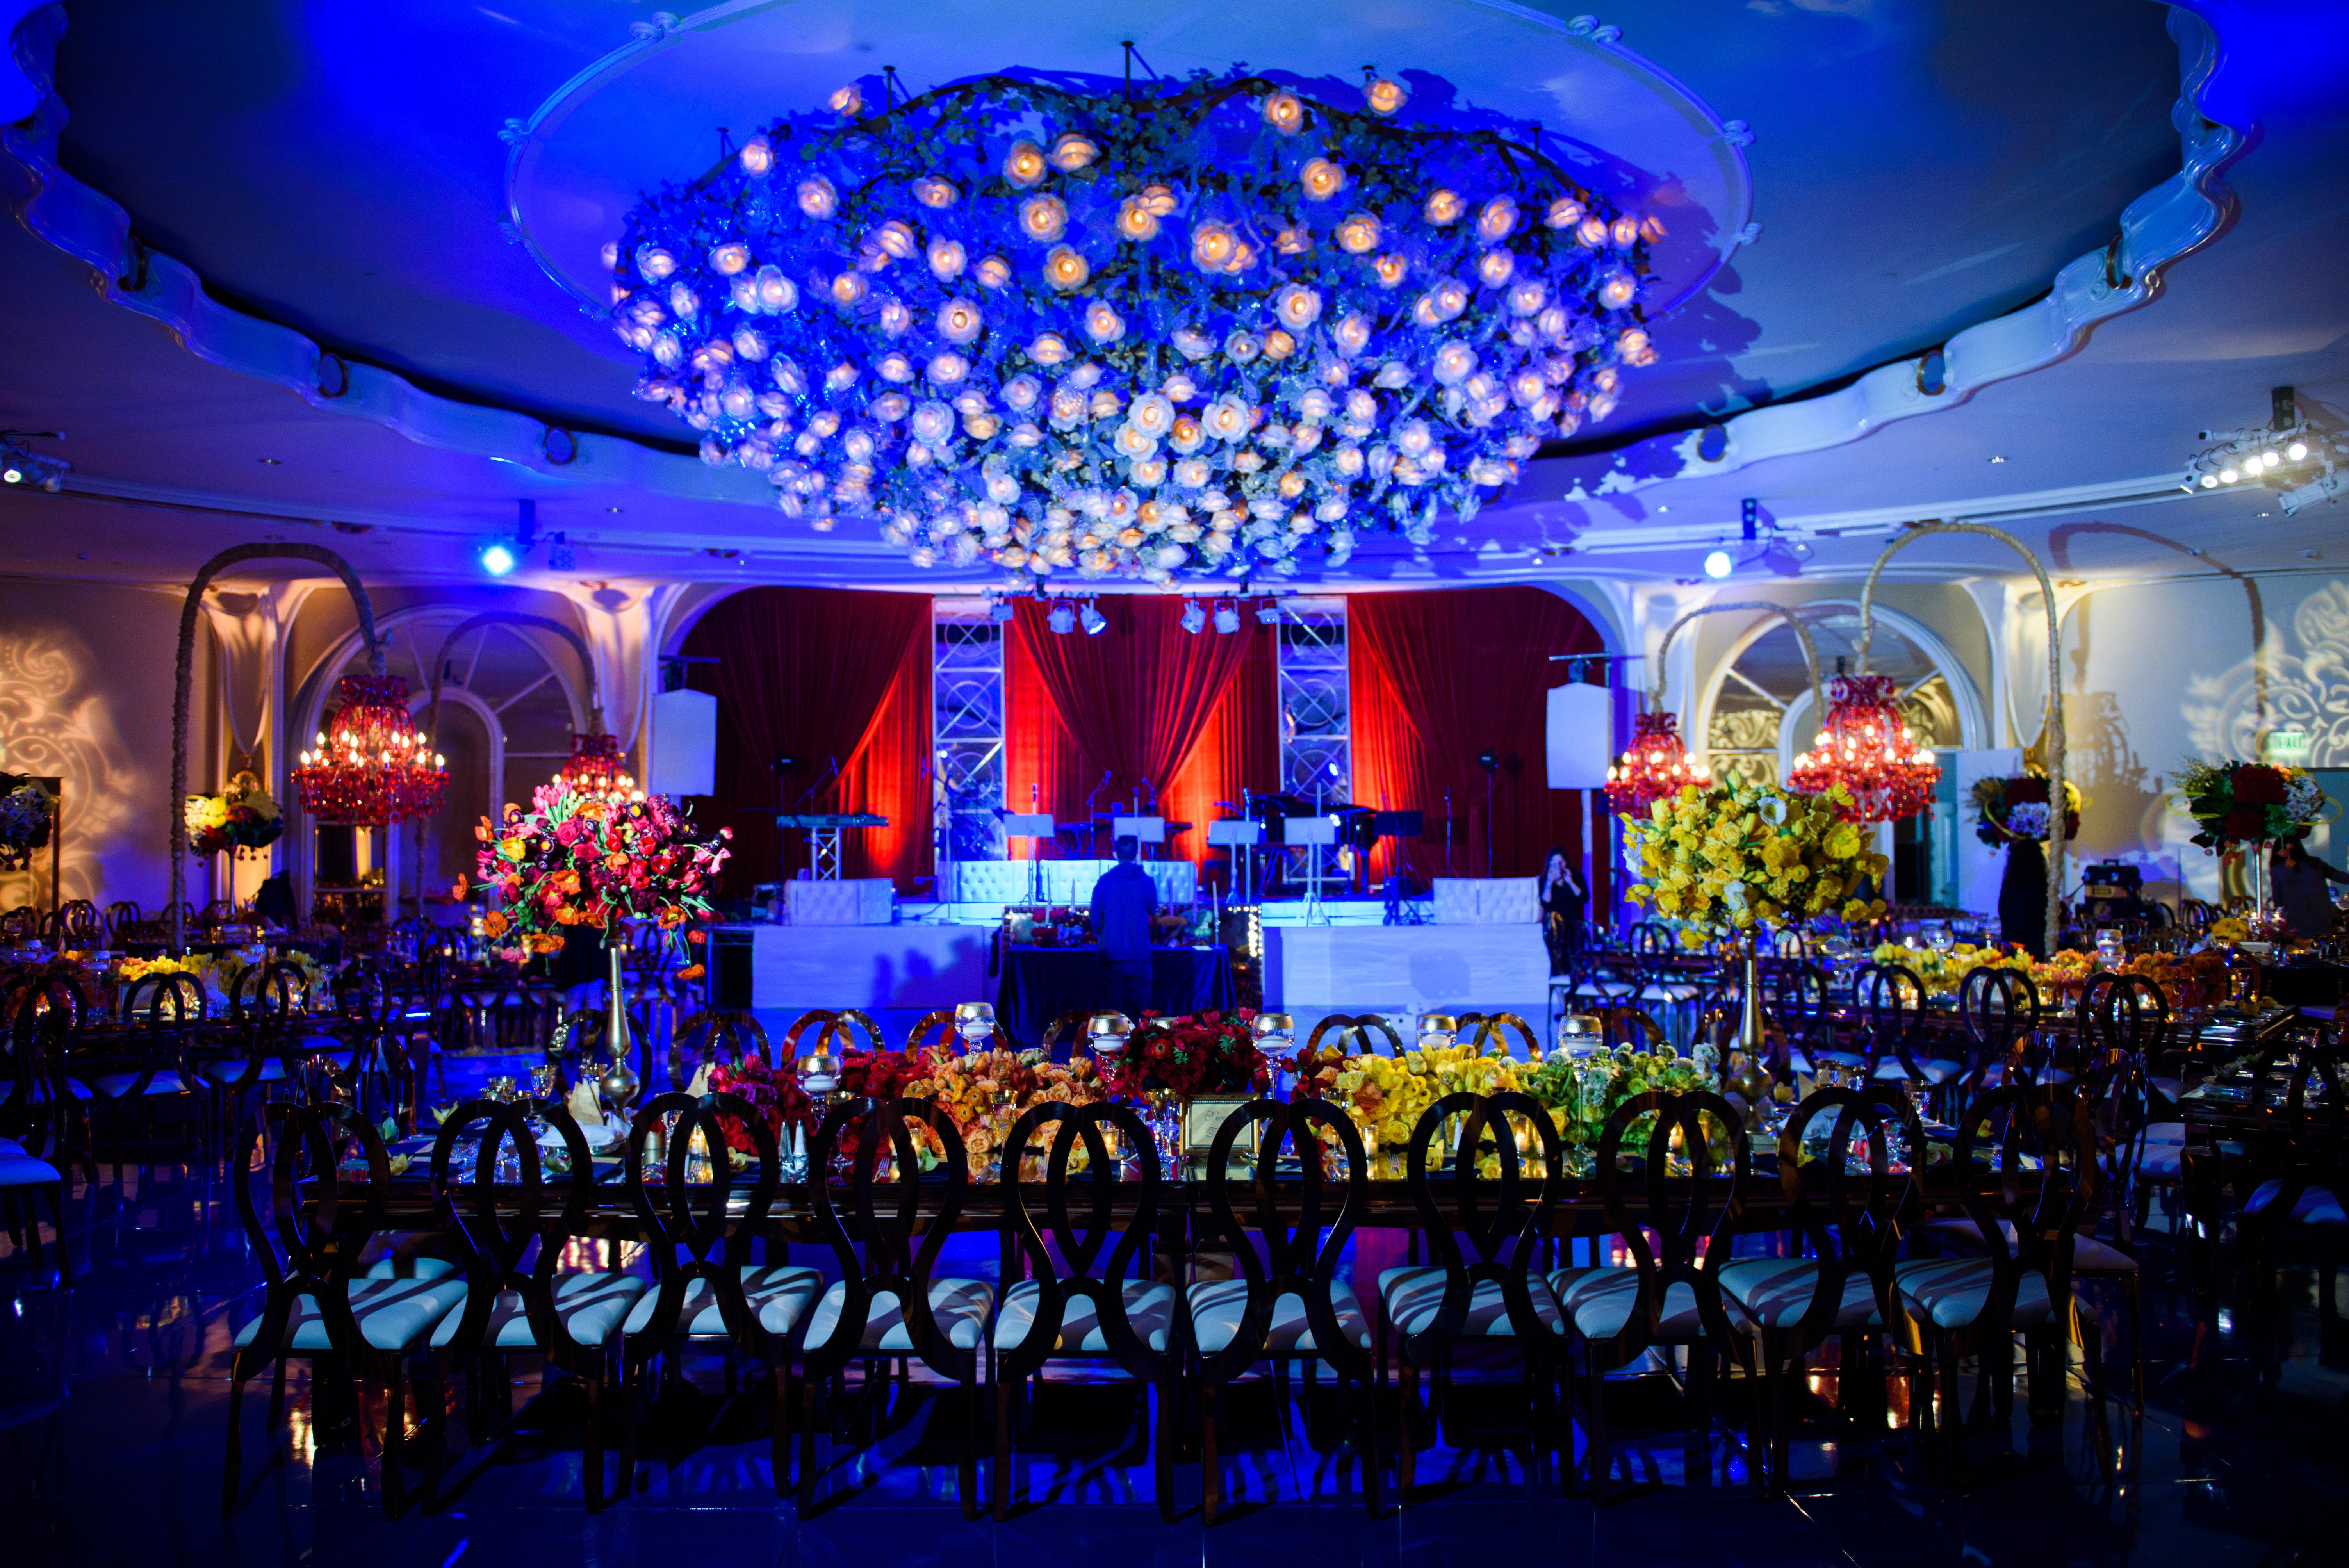 Red Luxurious Bar Mitzvah - LIV Entertainment Group